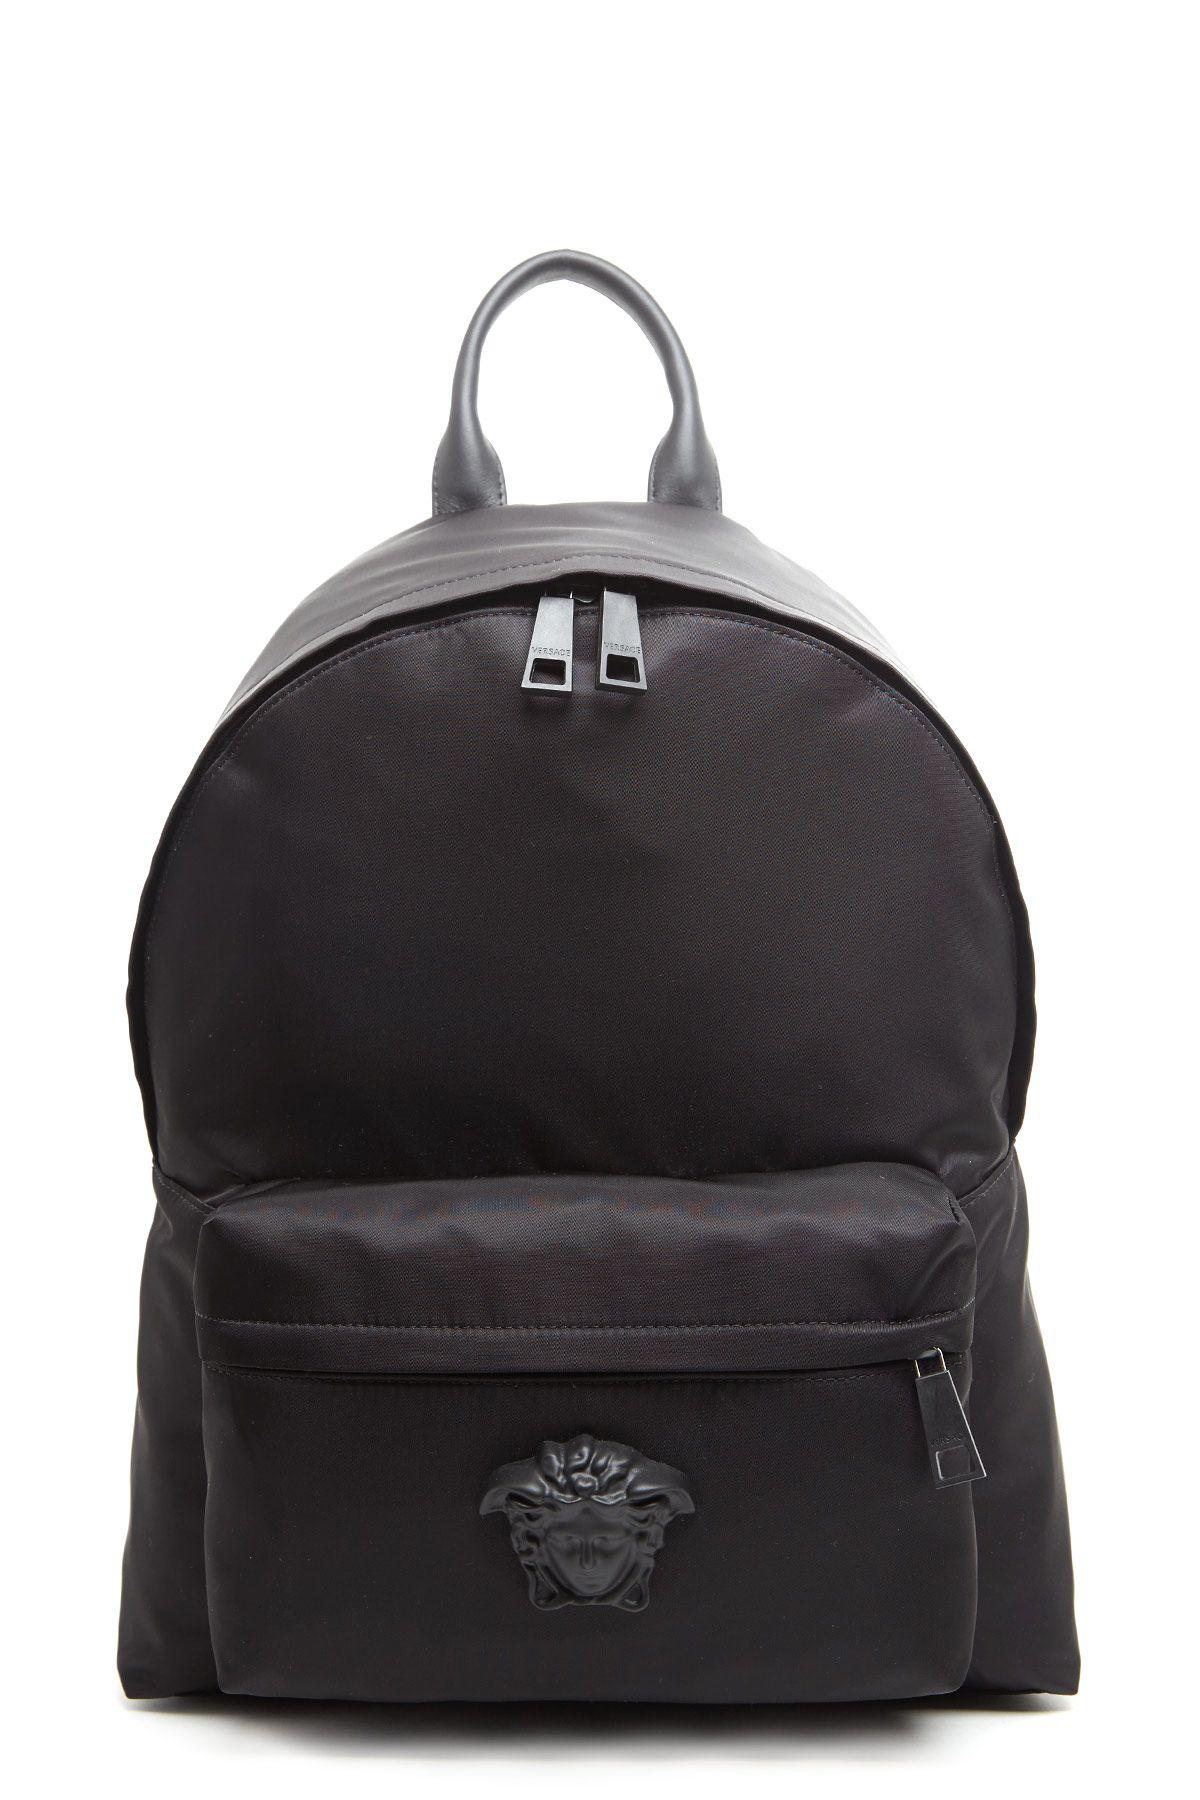 2240a3b74ad Versace bag in black modesens jpg 1200x1800 Versace bags